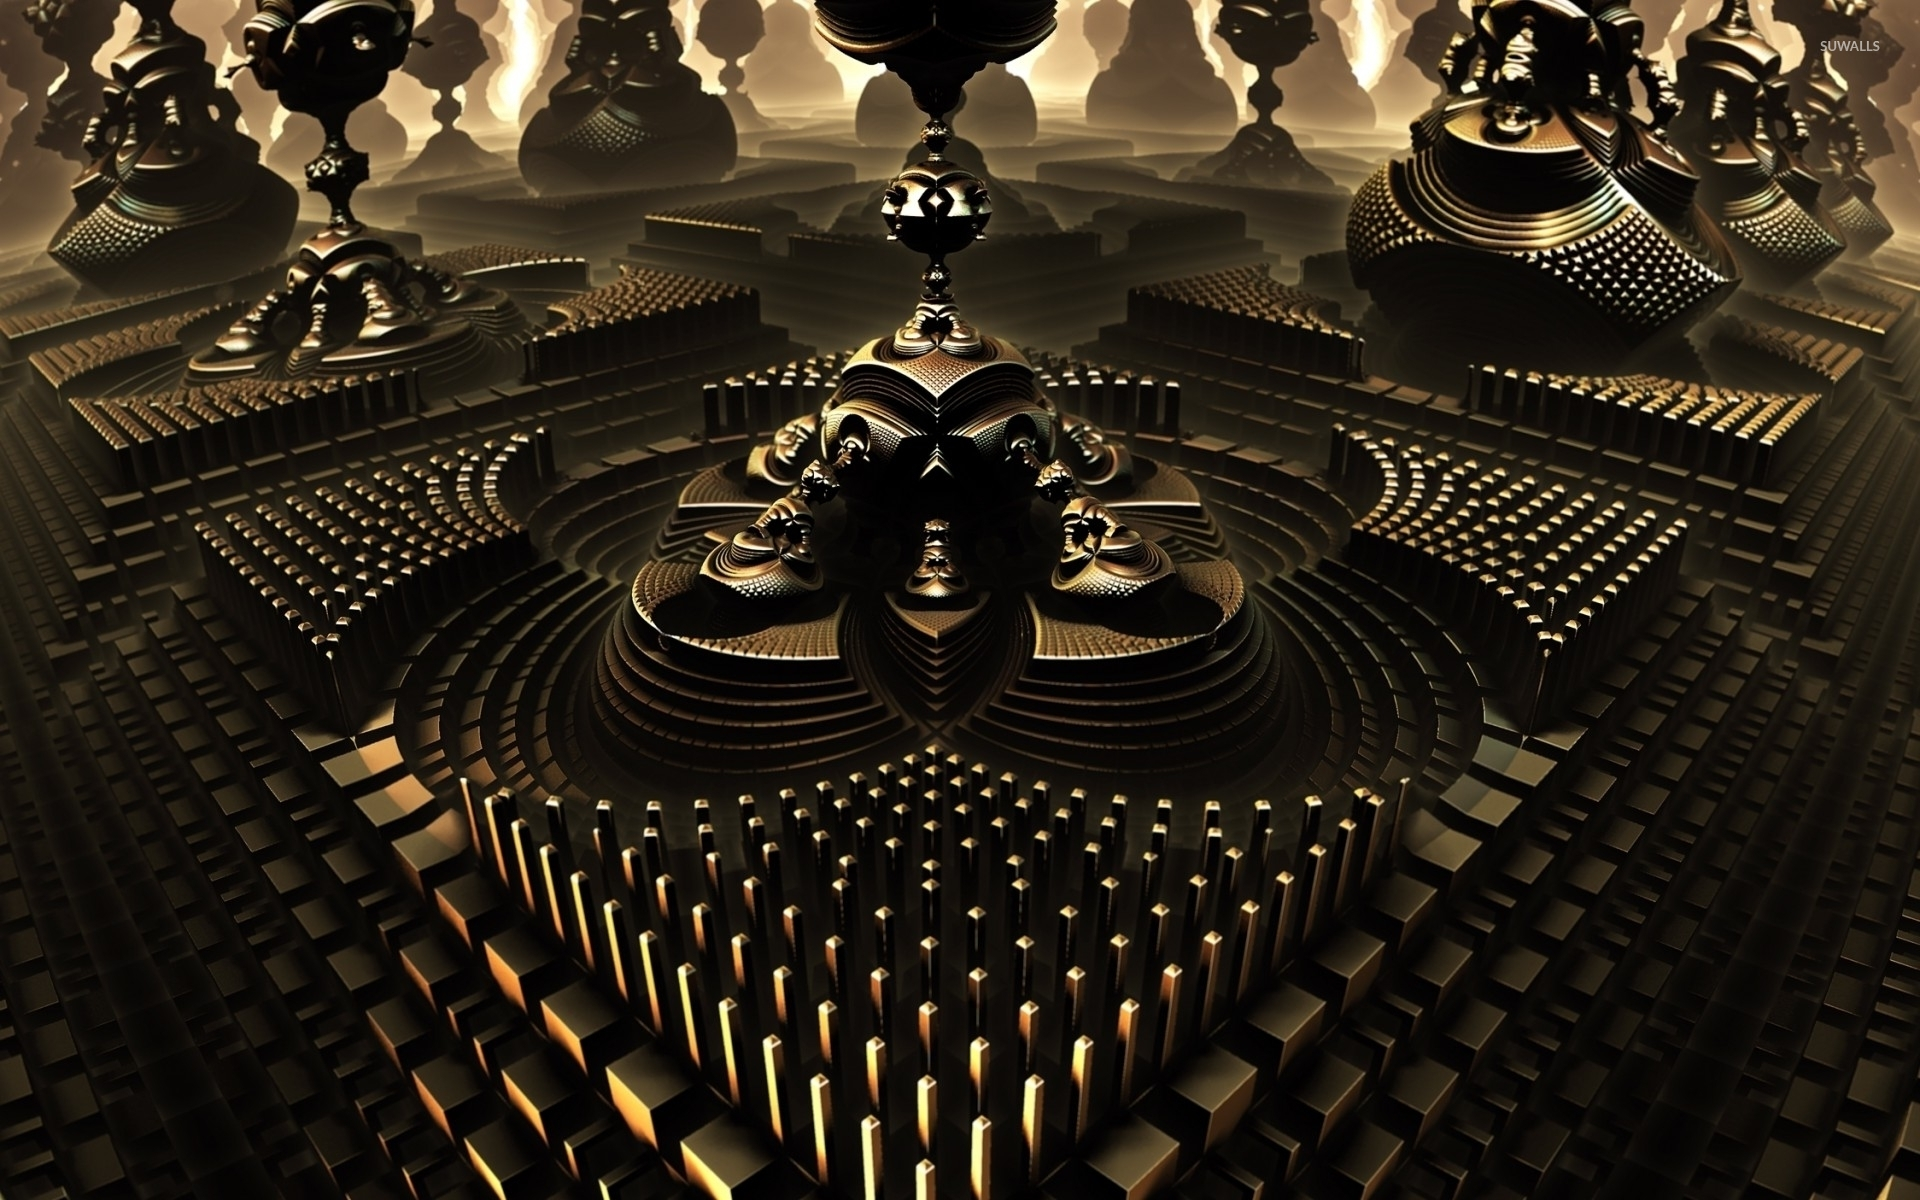 Golden temples wallpaper · 3D · Curve · Shape · 1920x1200 ...